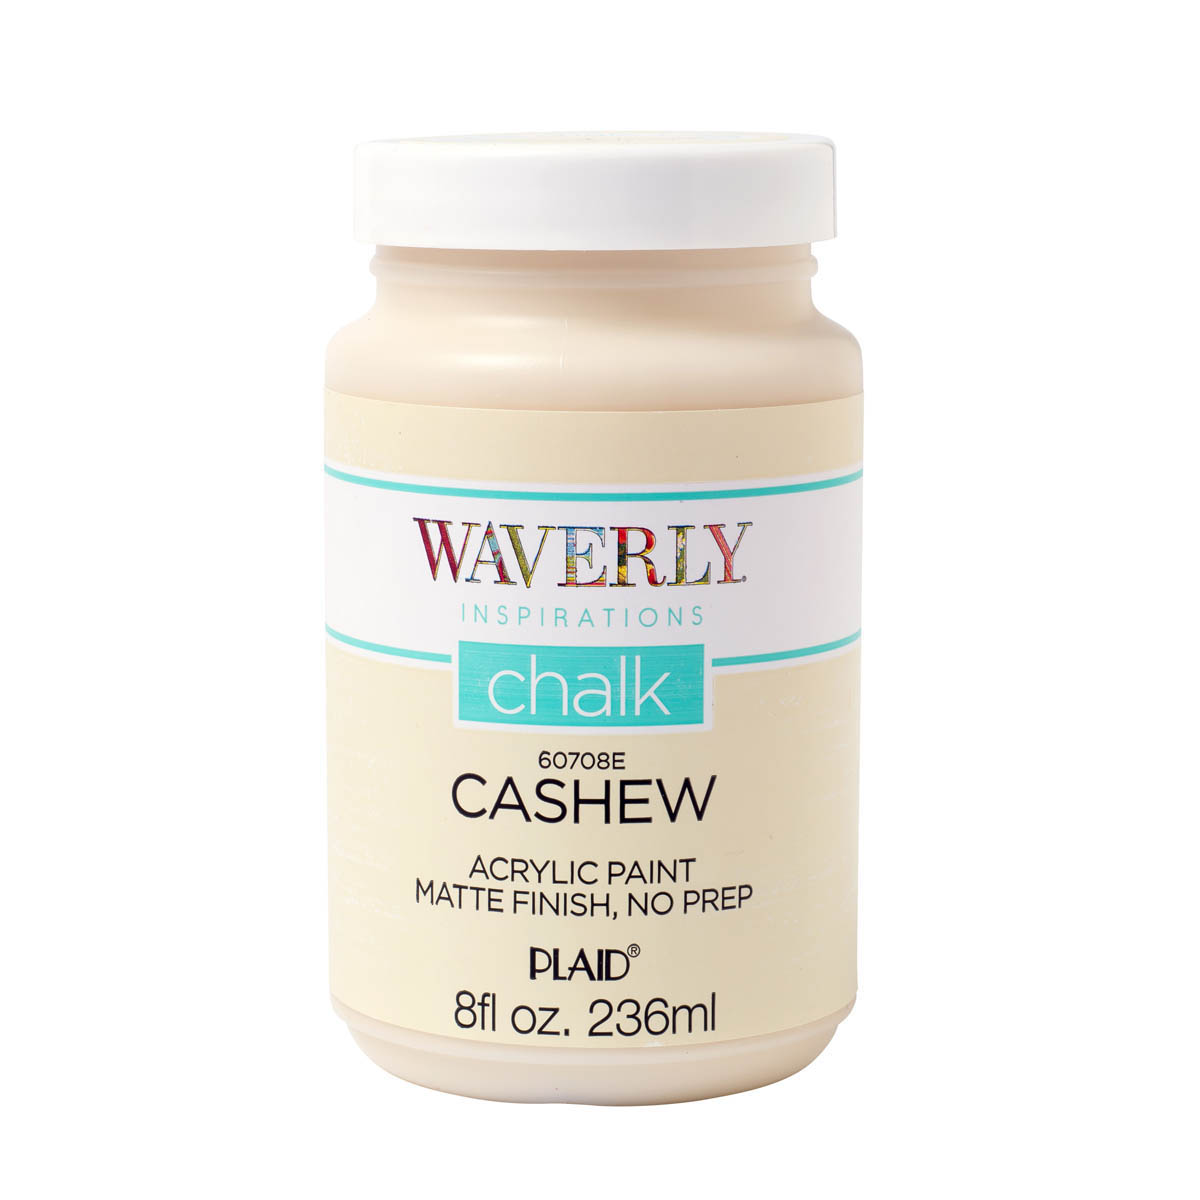 Waverly ® Inspirations Chalk Acrylic Paint - Cashew, 8 oz.